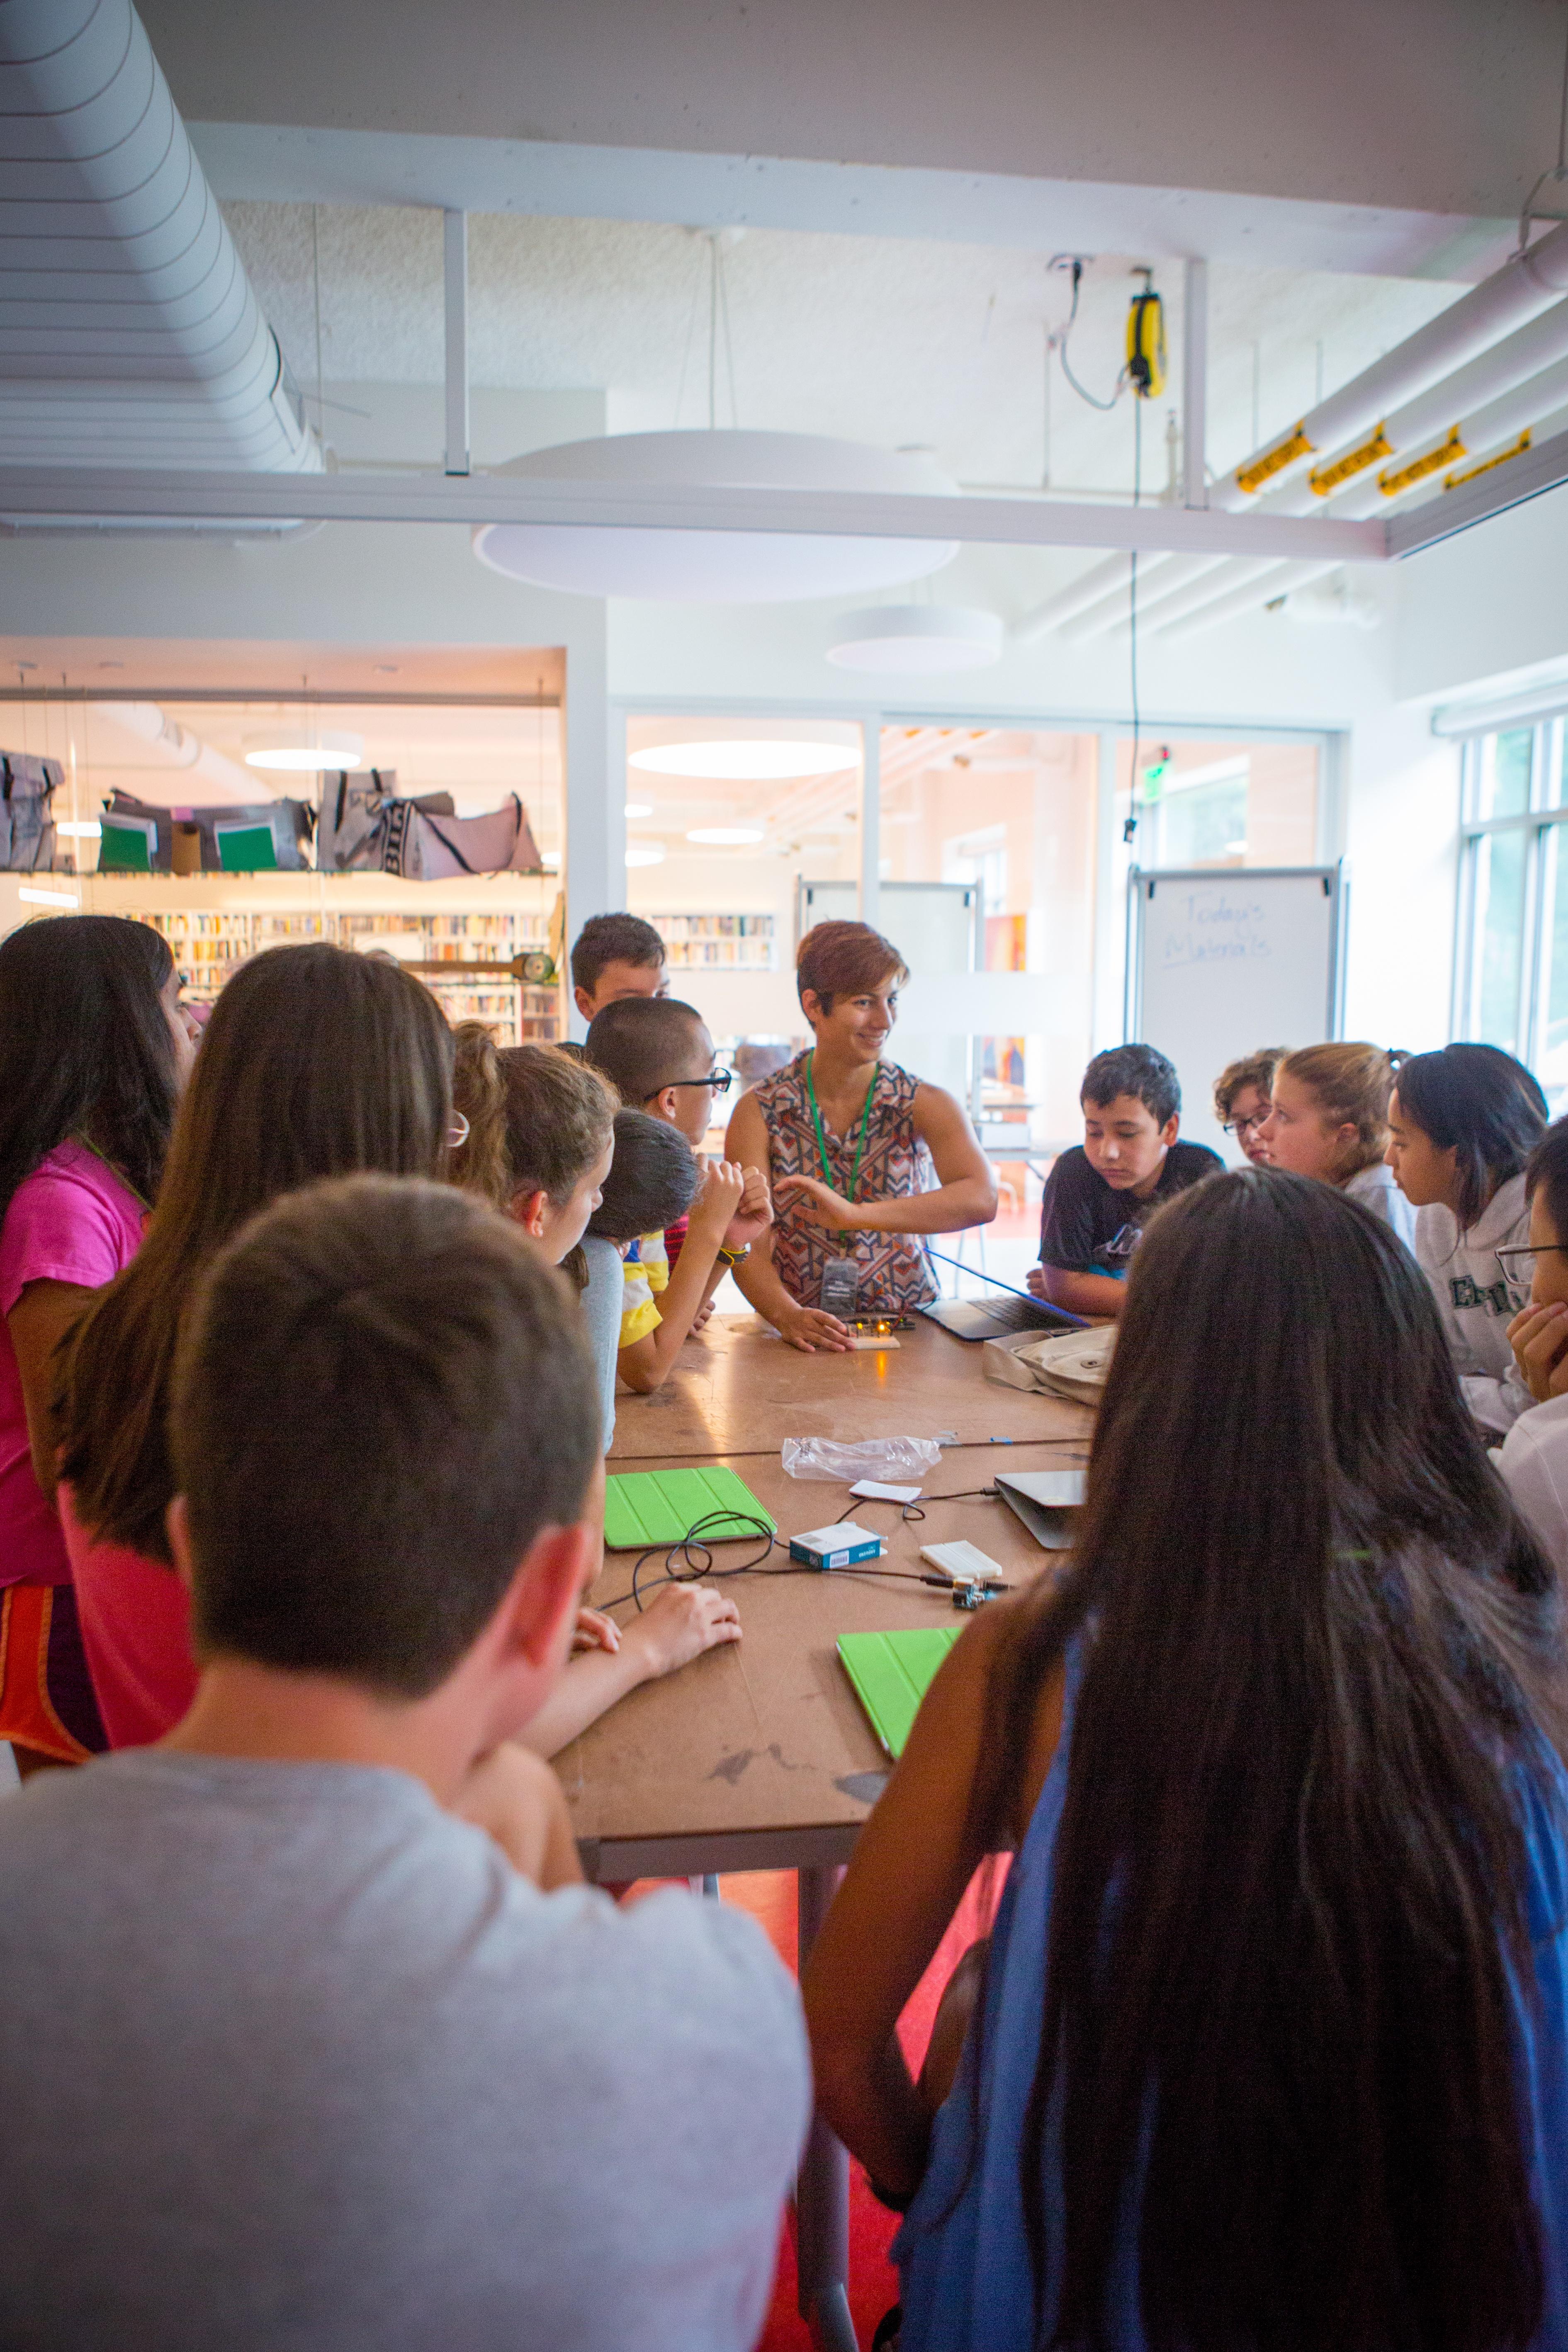 Electronics Teacher Ms. Jimenez explains the finer points of constructing a circuit board.